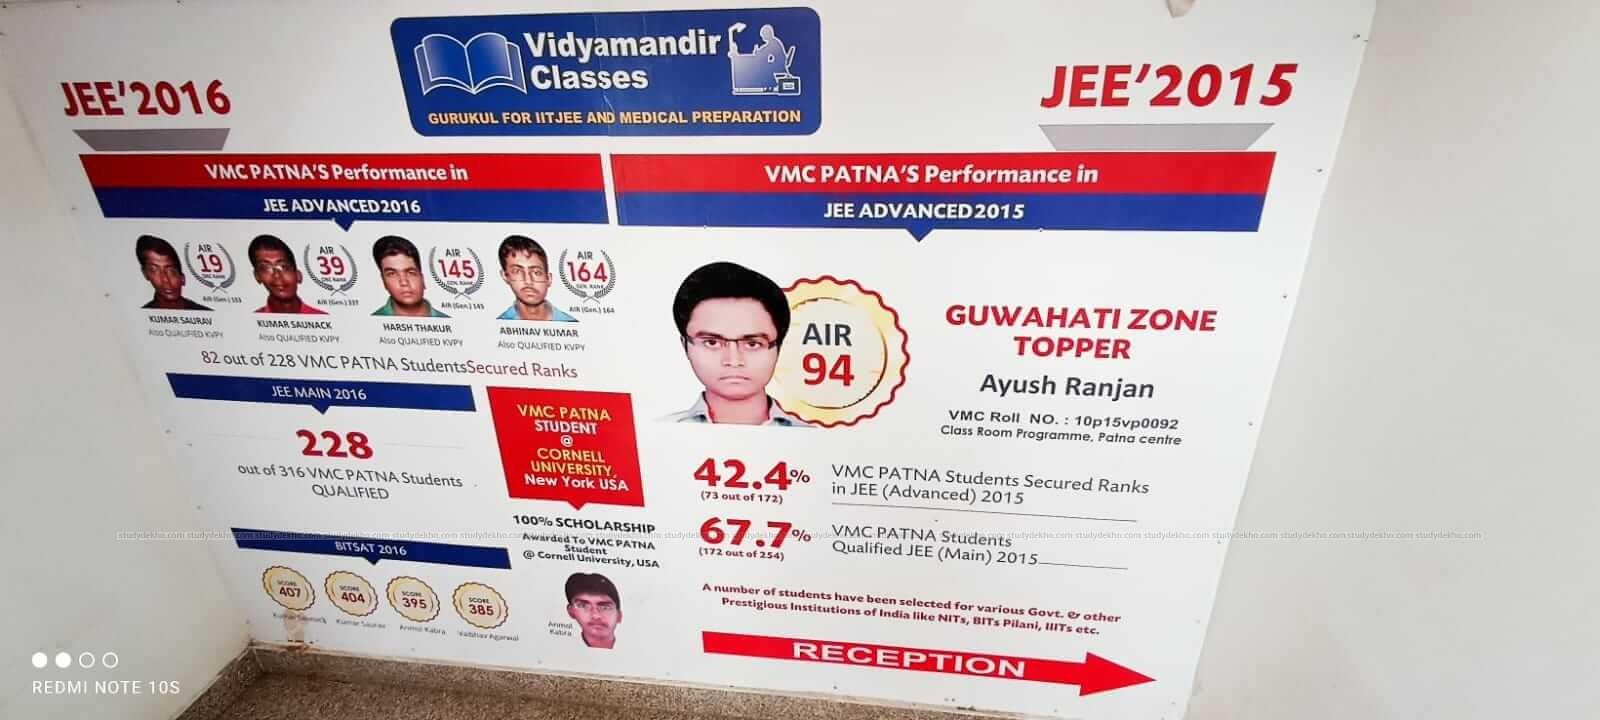 Vidya Mandir Classes Logo